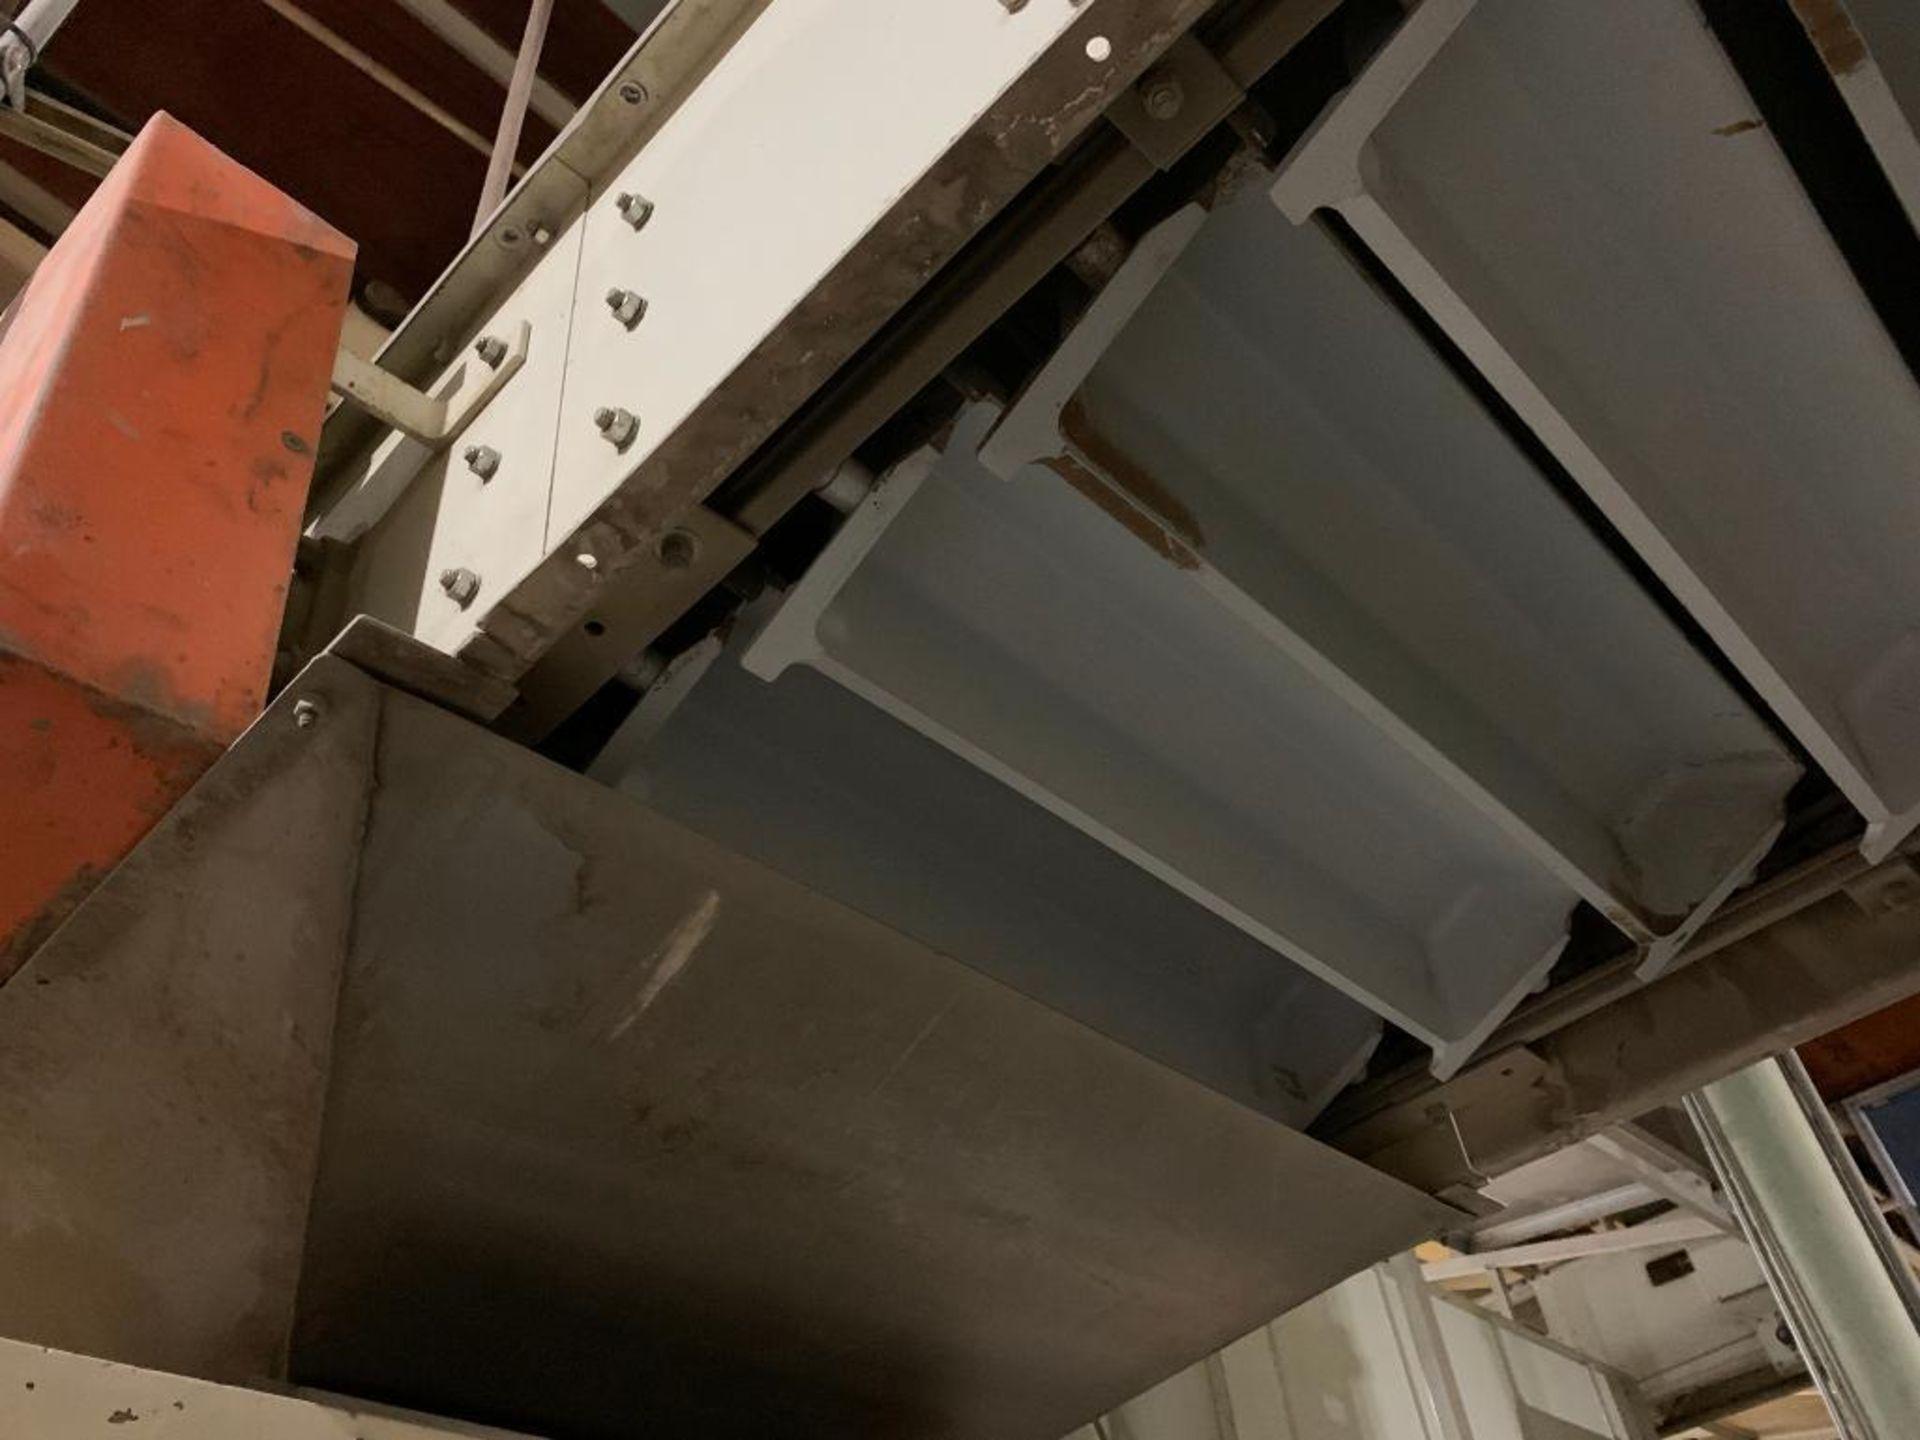 Meyer overlapping bucket elevator, model PA462-24-S - Image 17 of 17